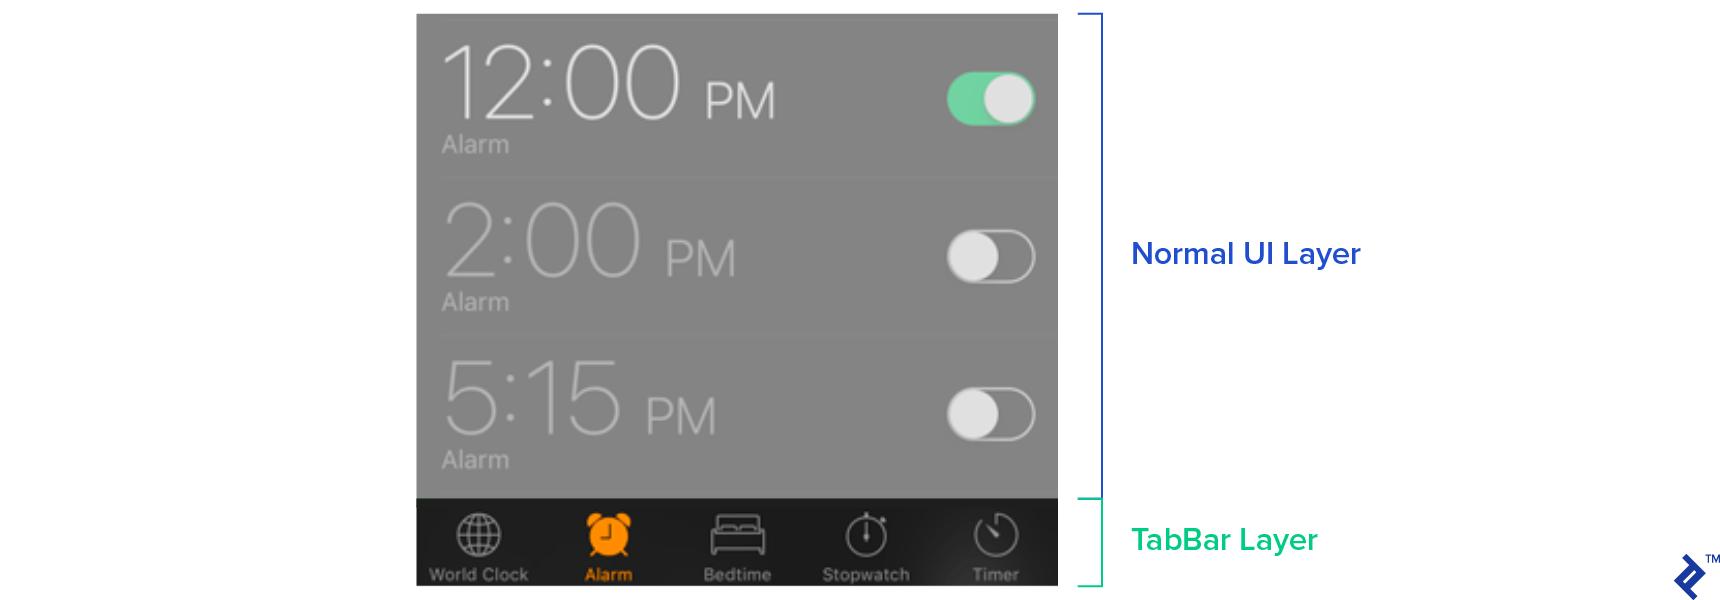 iOS TabBar layering example